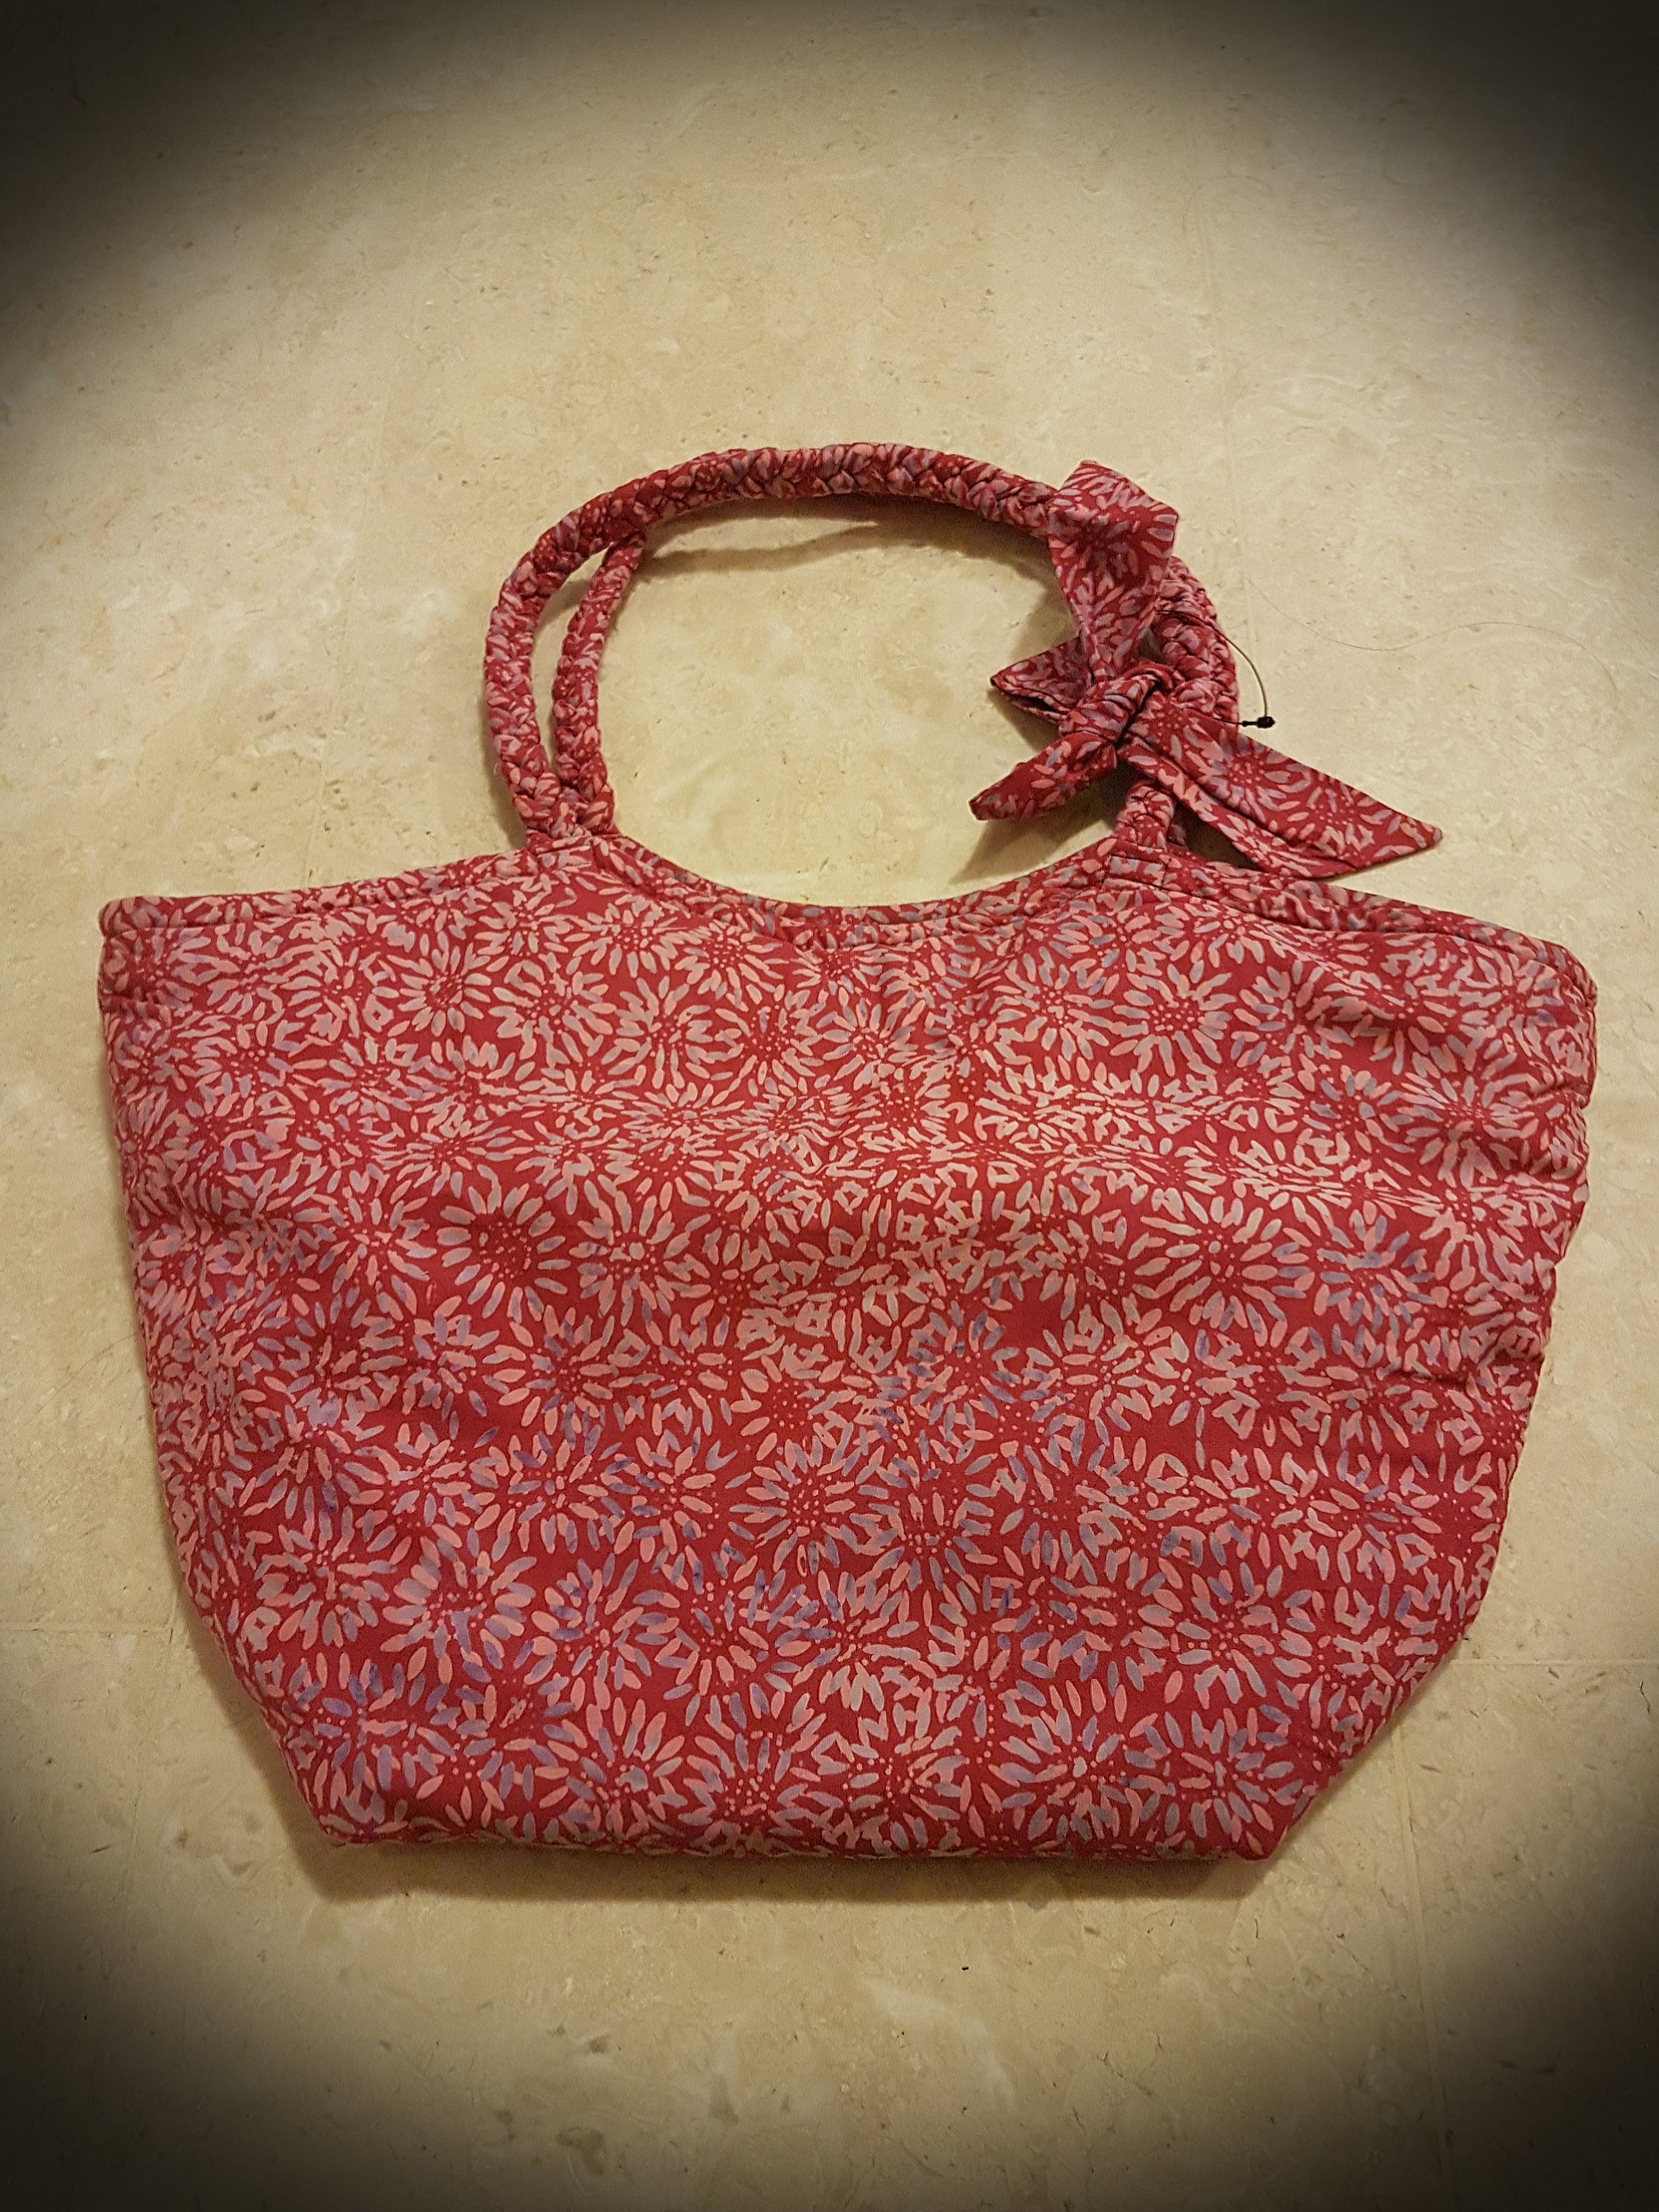 Bn Authentic Batik Keris Bag Women S Fashion Bags Wallets Handbags On Carou